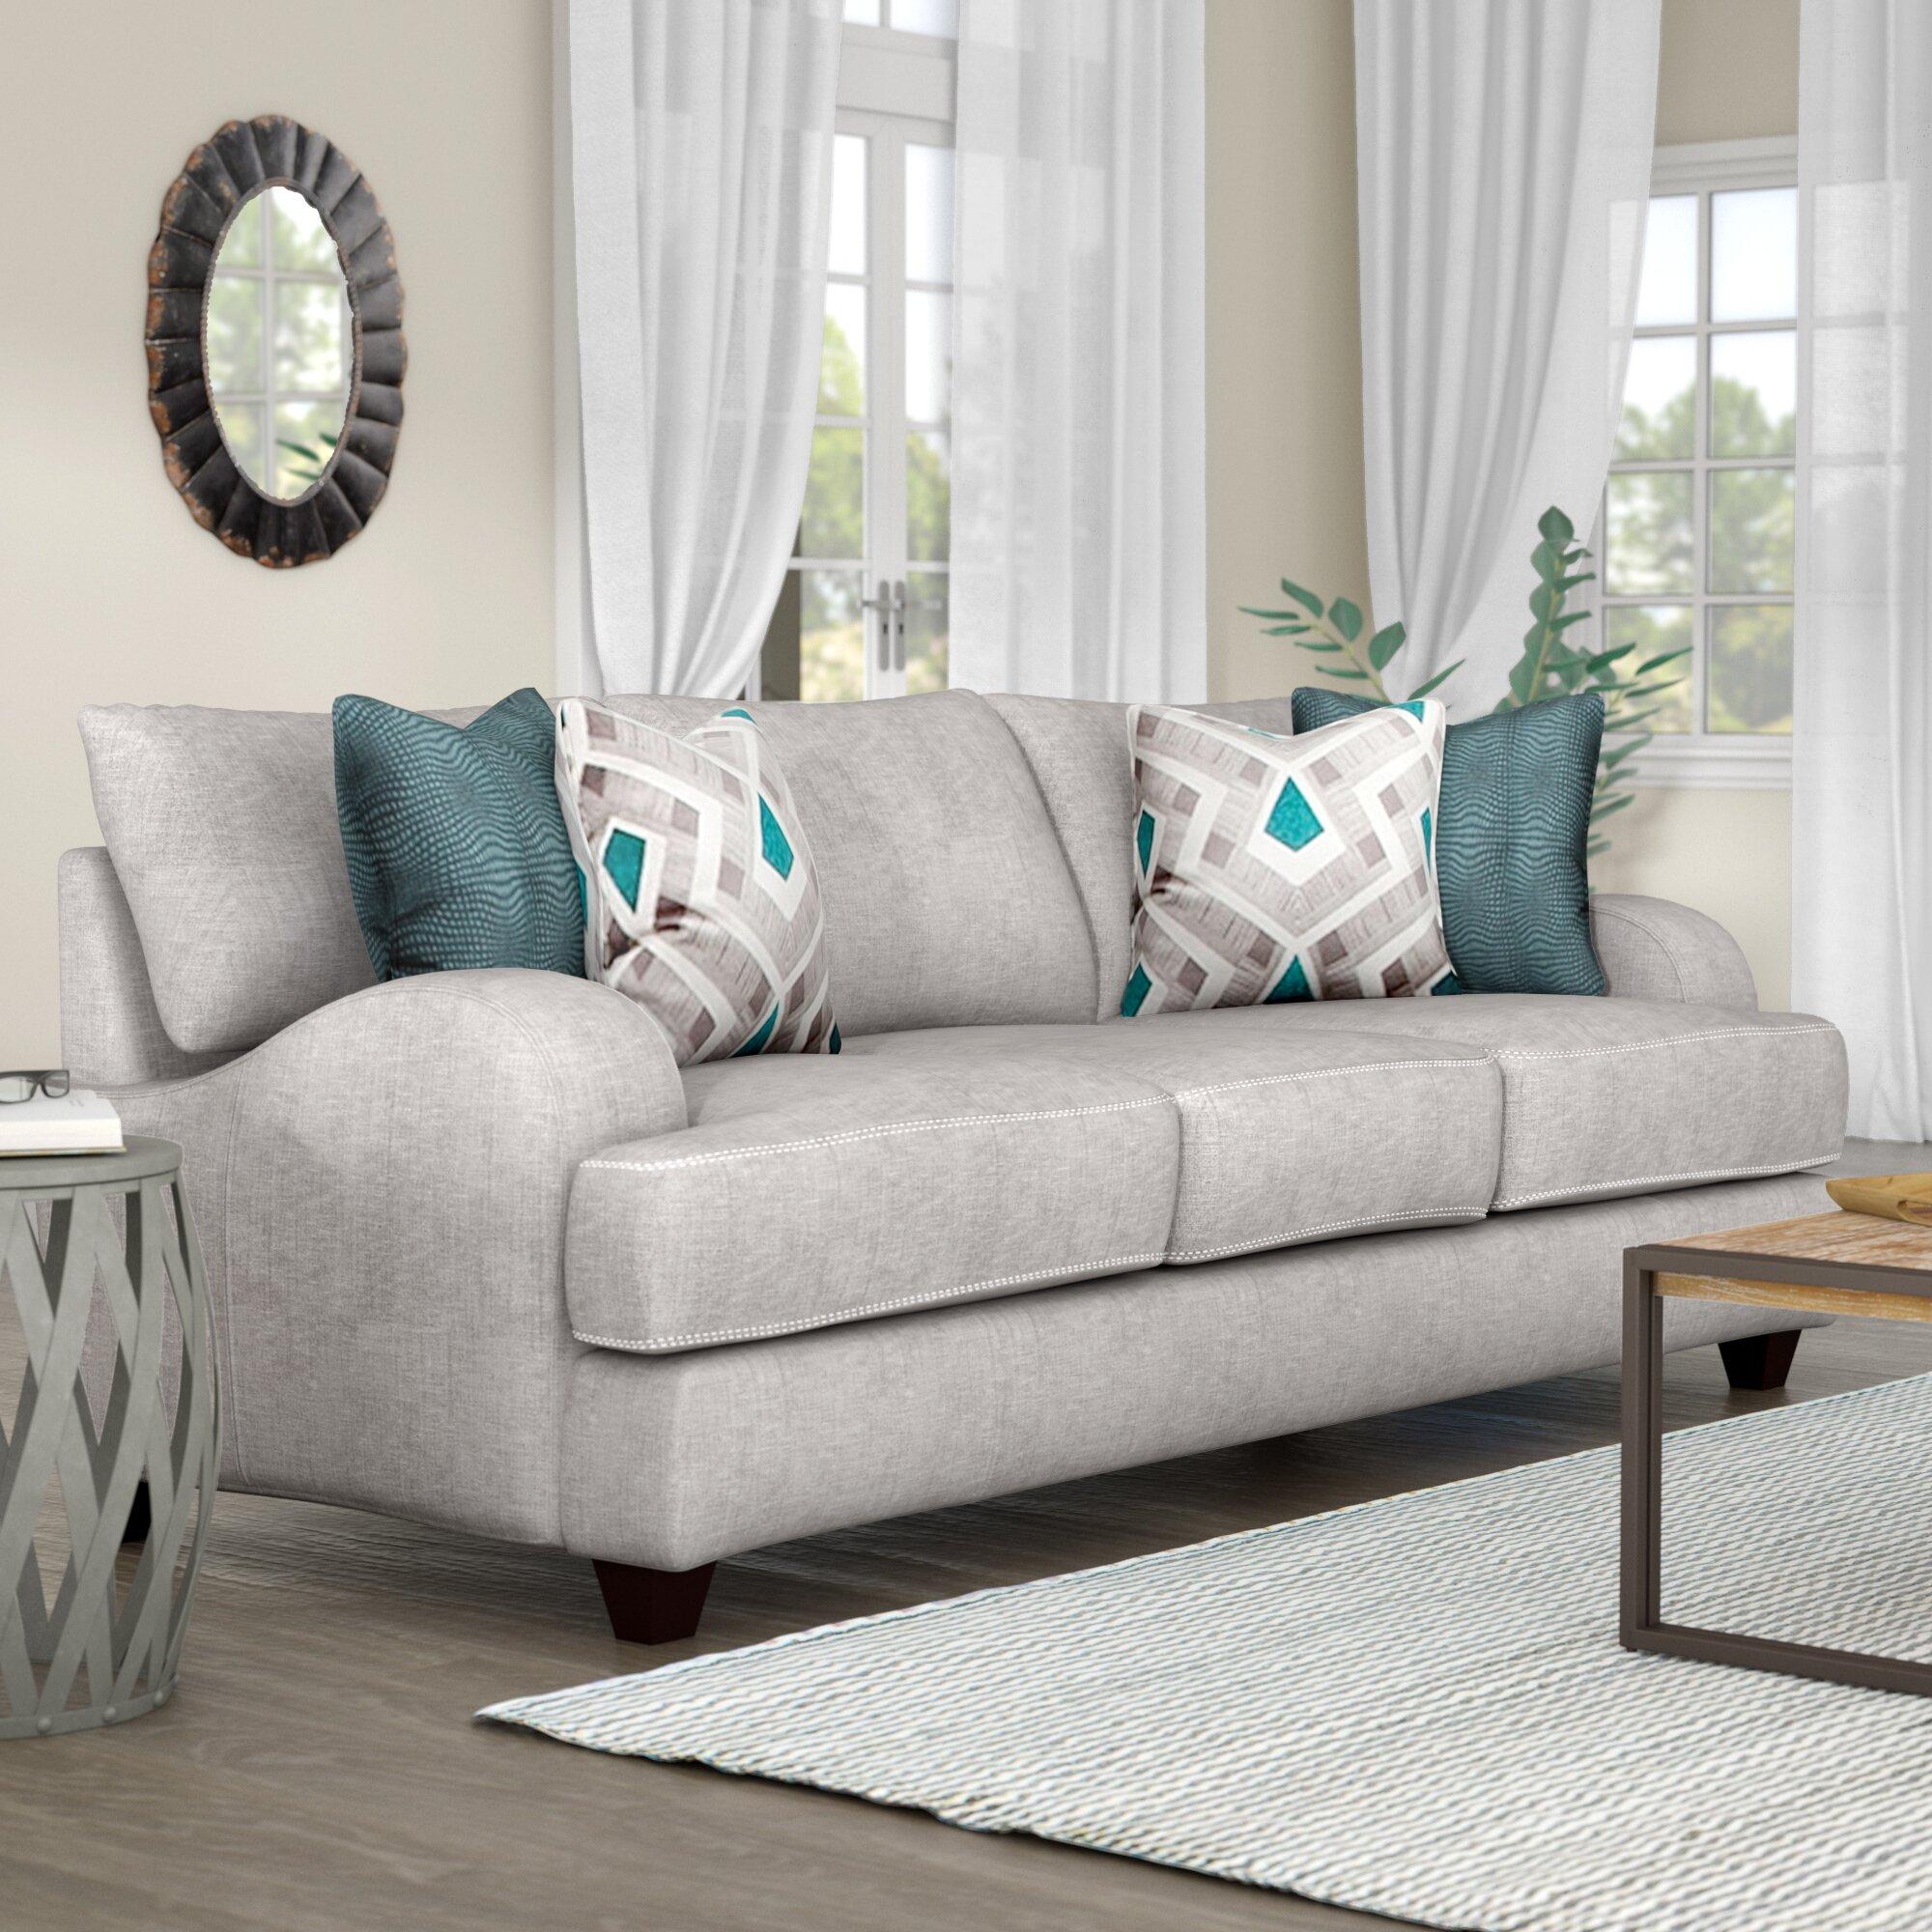 Laurel foundry modern farmhouse rosalie sofa reviews - Laurel foundry modern farmhouse bedroom ...